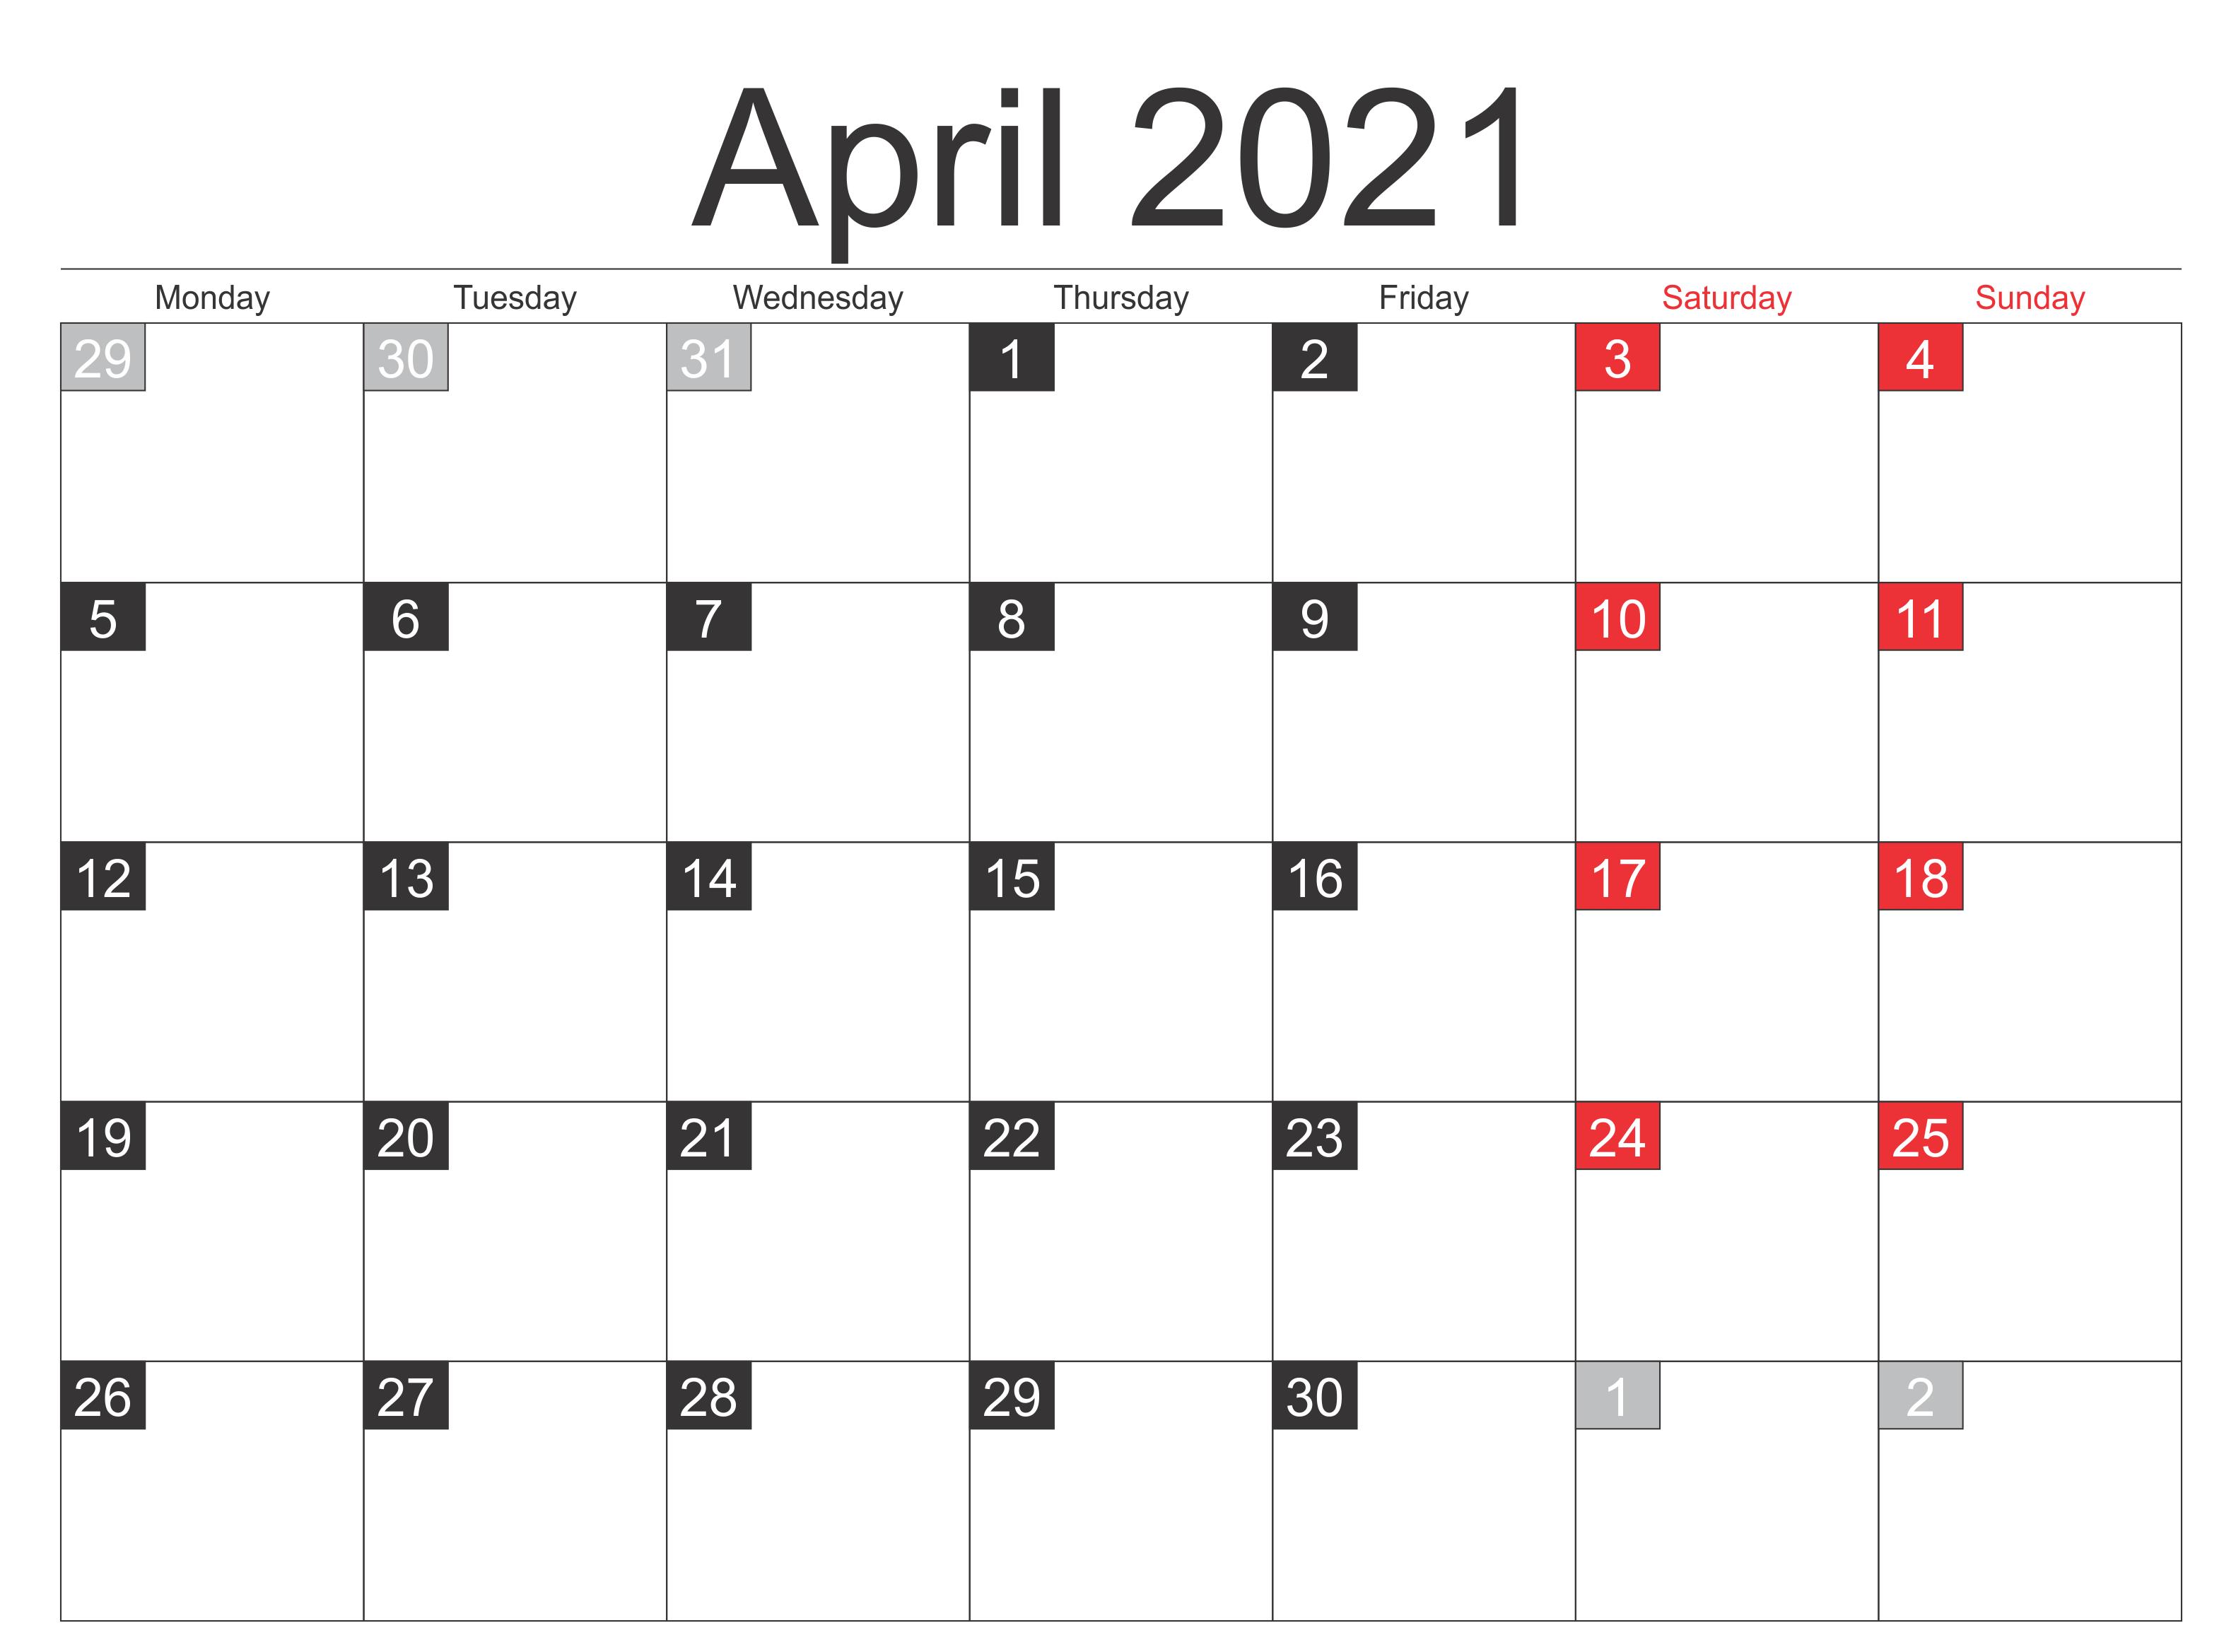 April 2021 Calendar Blank